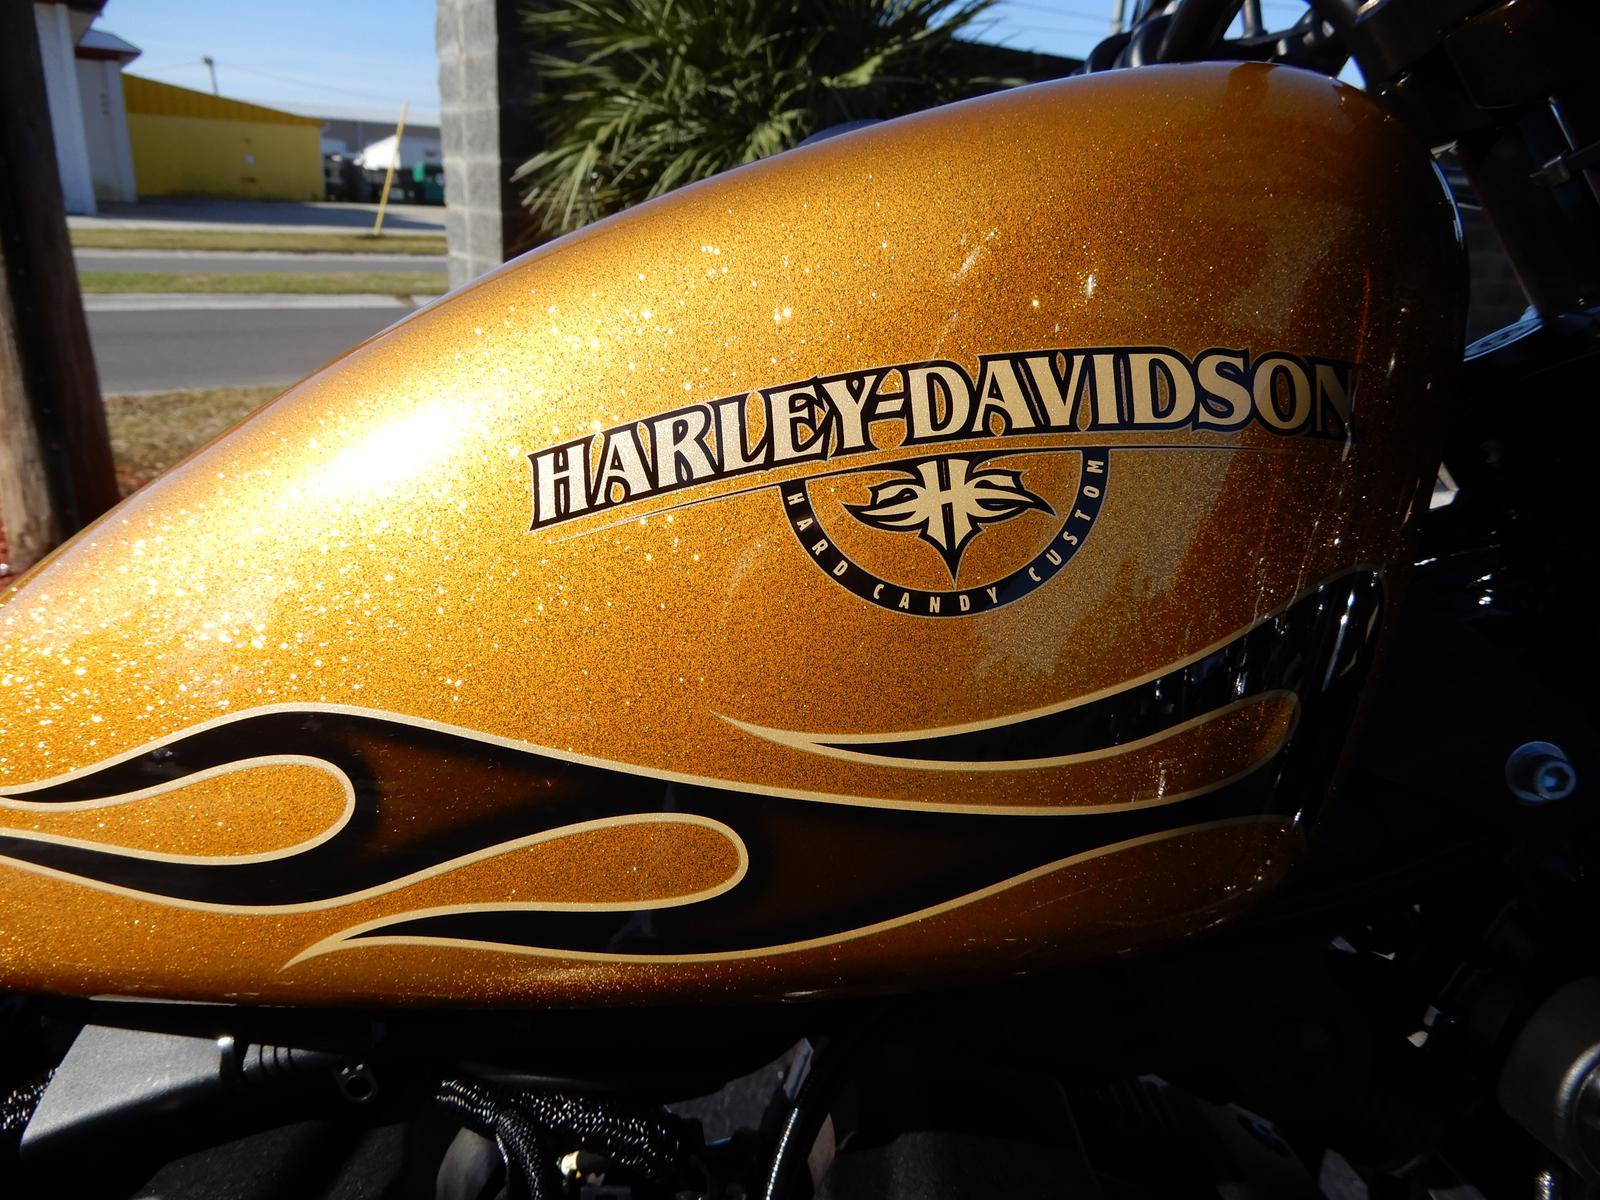 2016 Harley Davidson Sportster Iron 883 For Sale In Myrtle Beach Wire Harness A 73 Ironhead Dscn4291